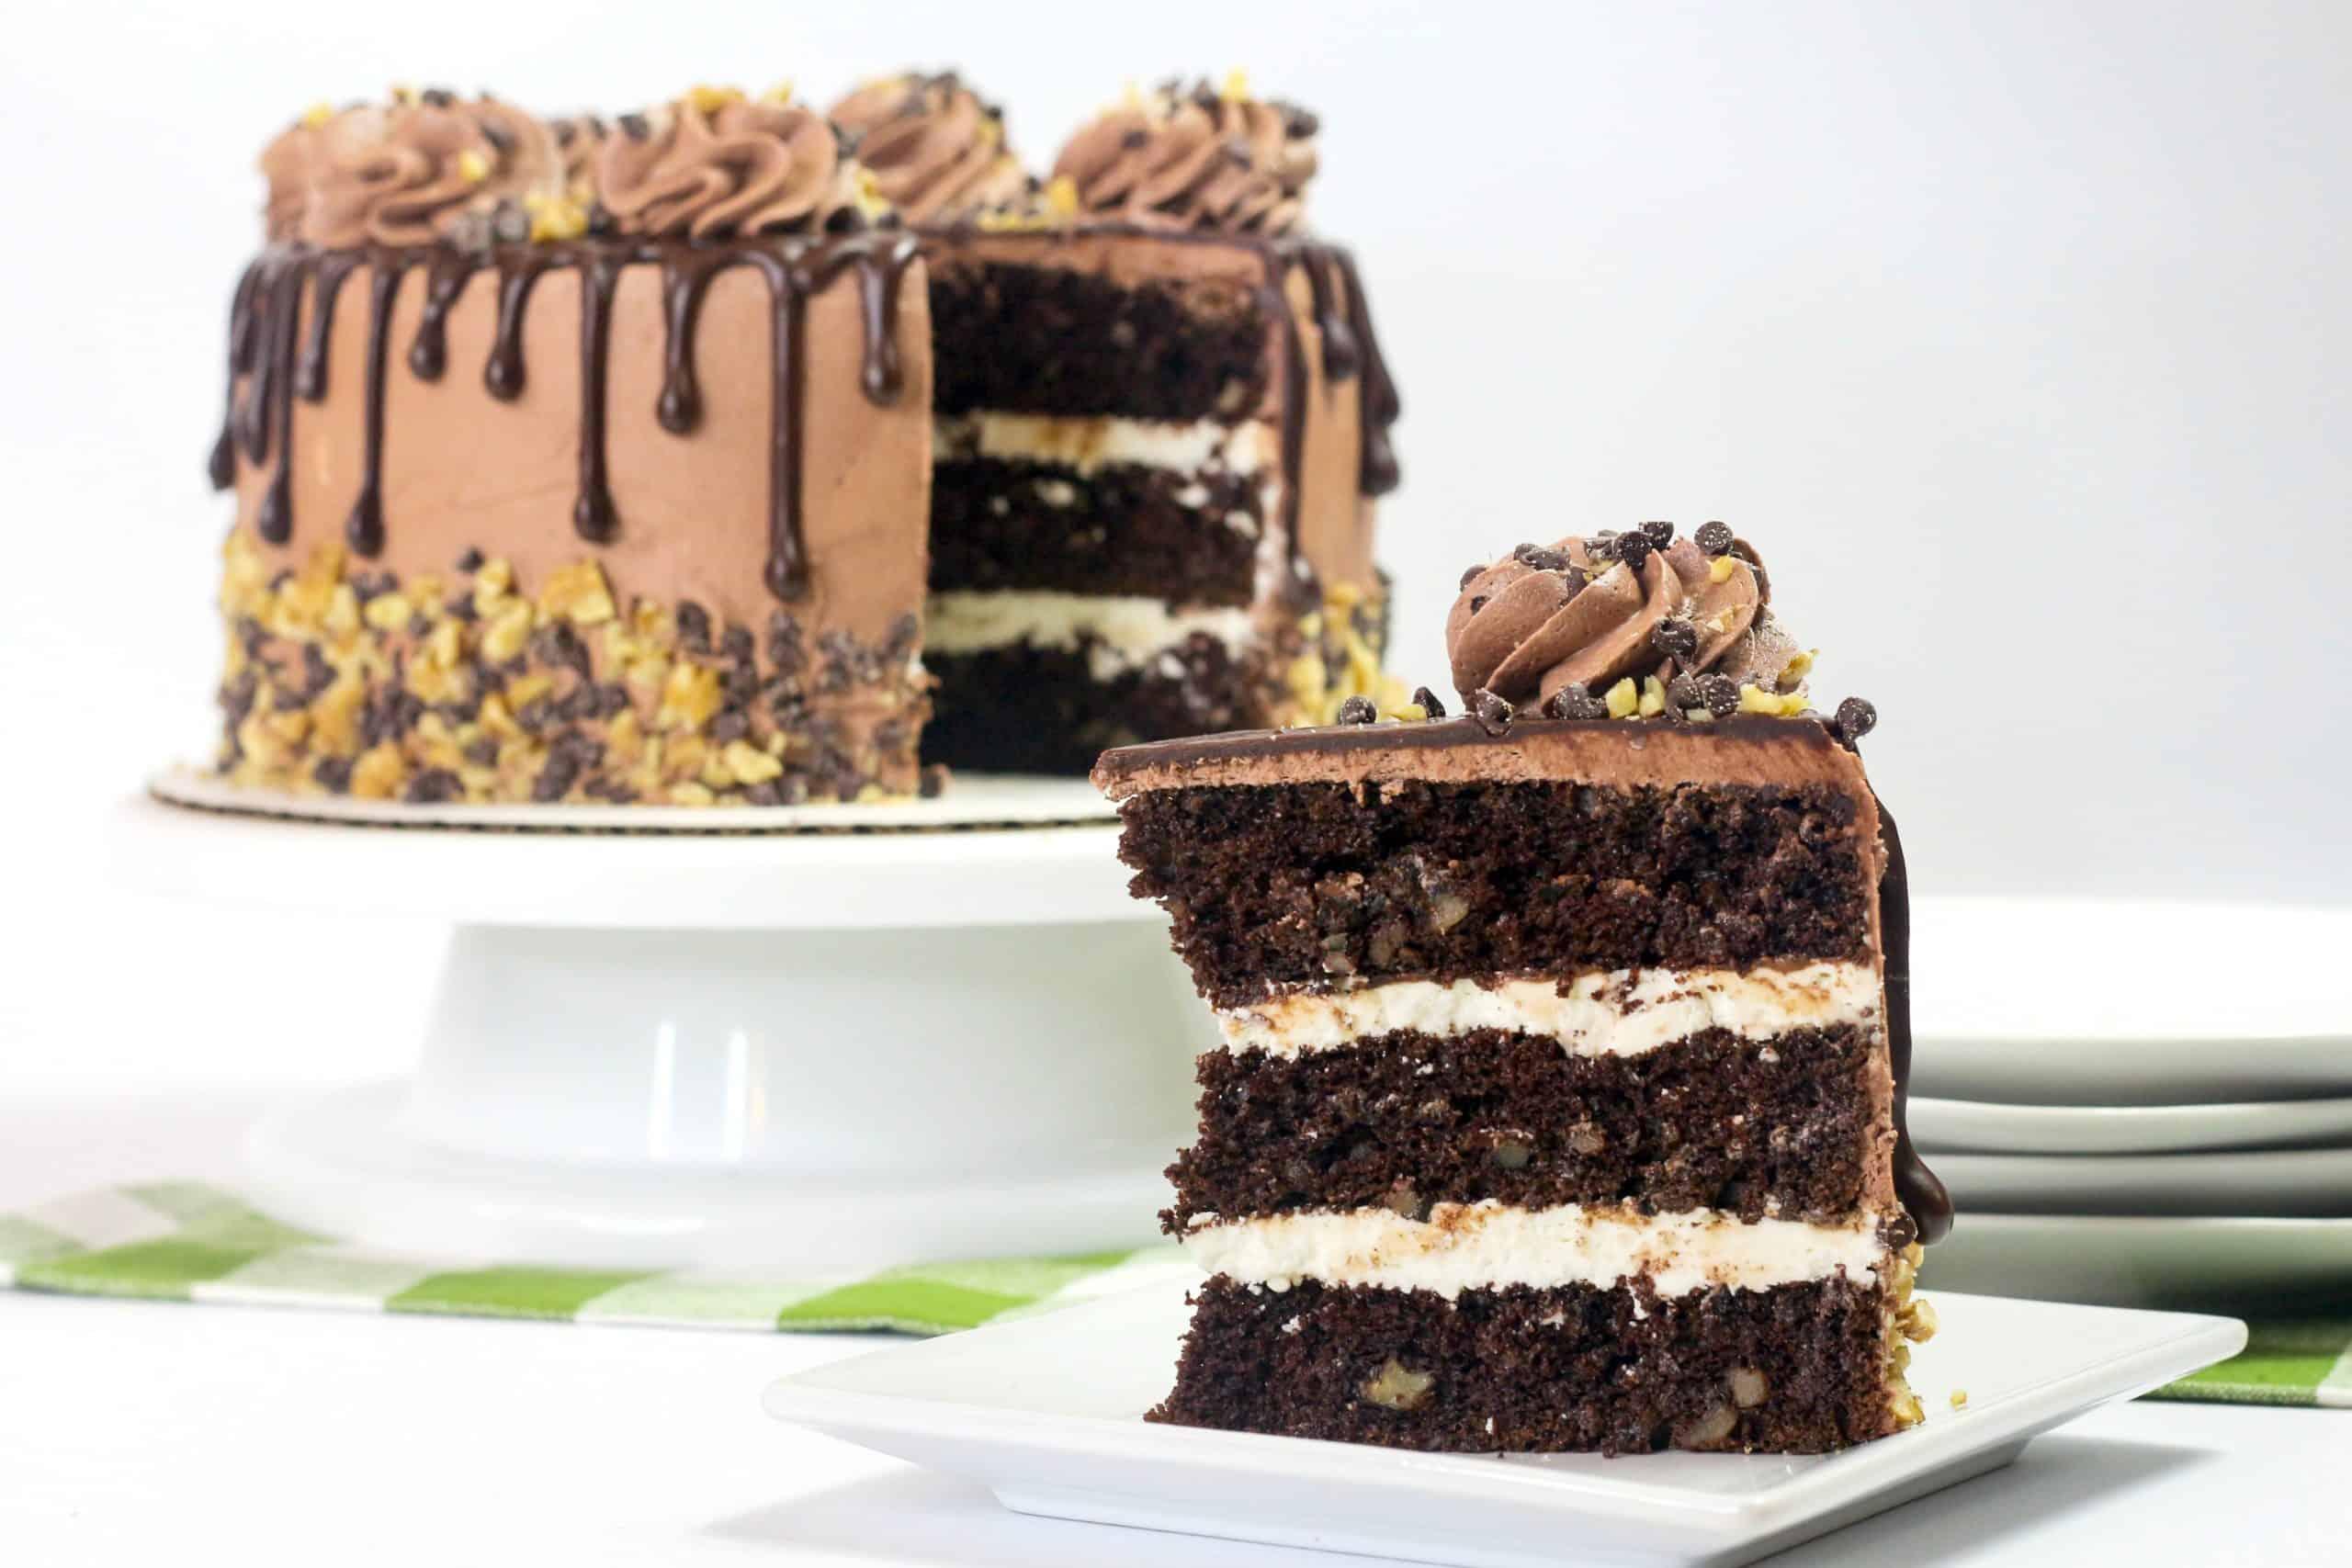 slice of chocolate fudge cake on a white plate